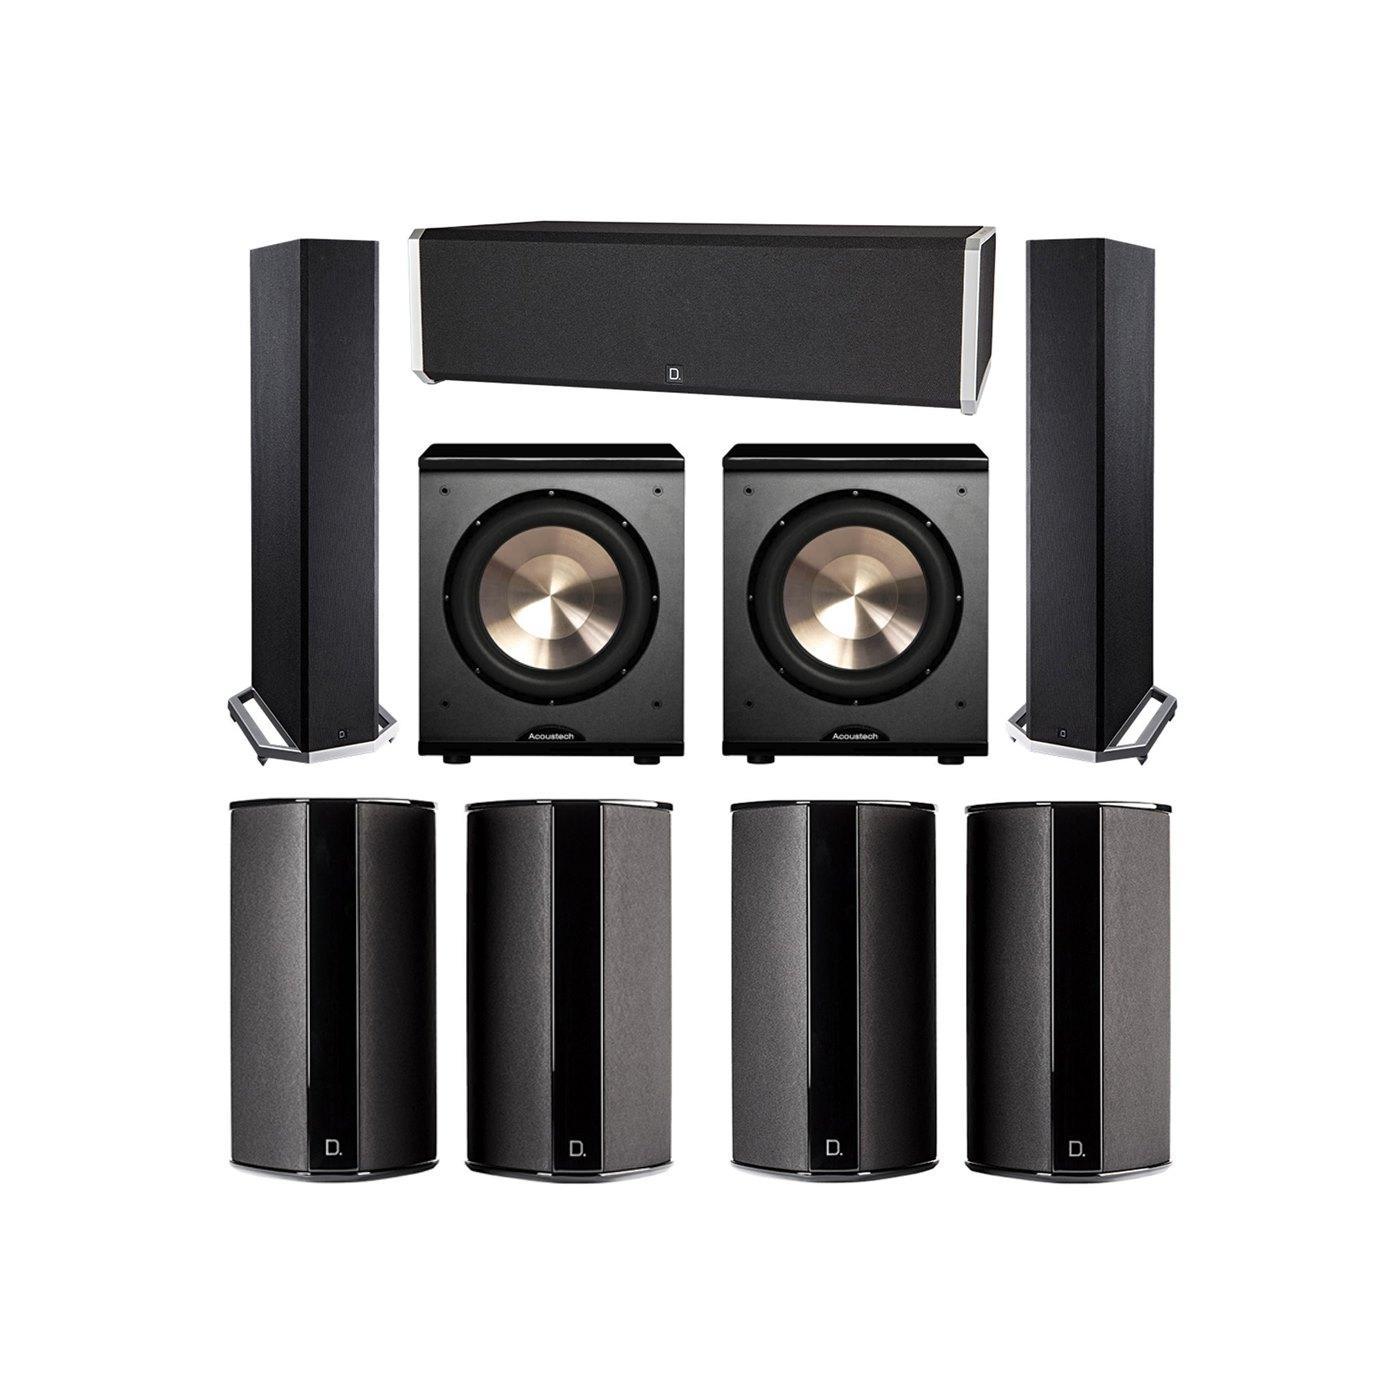 Definitive Technology 7.2 System with 2 BP9020 Tower Speakers, 1 CS9040 Center Channel Speaker, 4 SR9080 Surround Speaker, 2 BIC PL-200 Subwoofer